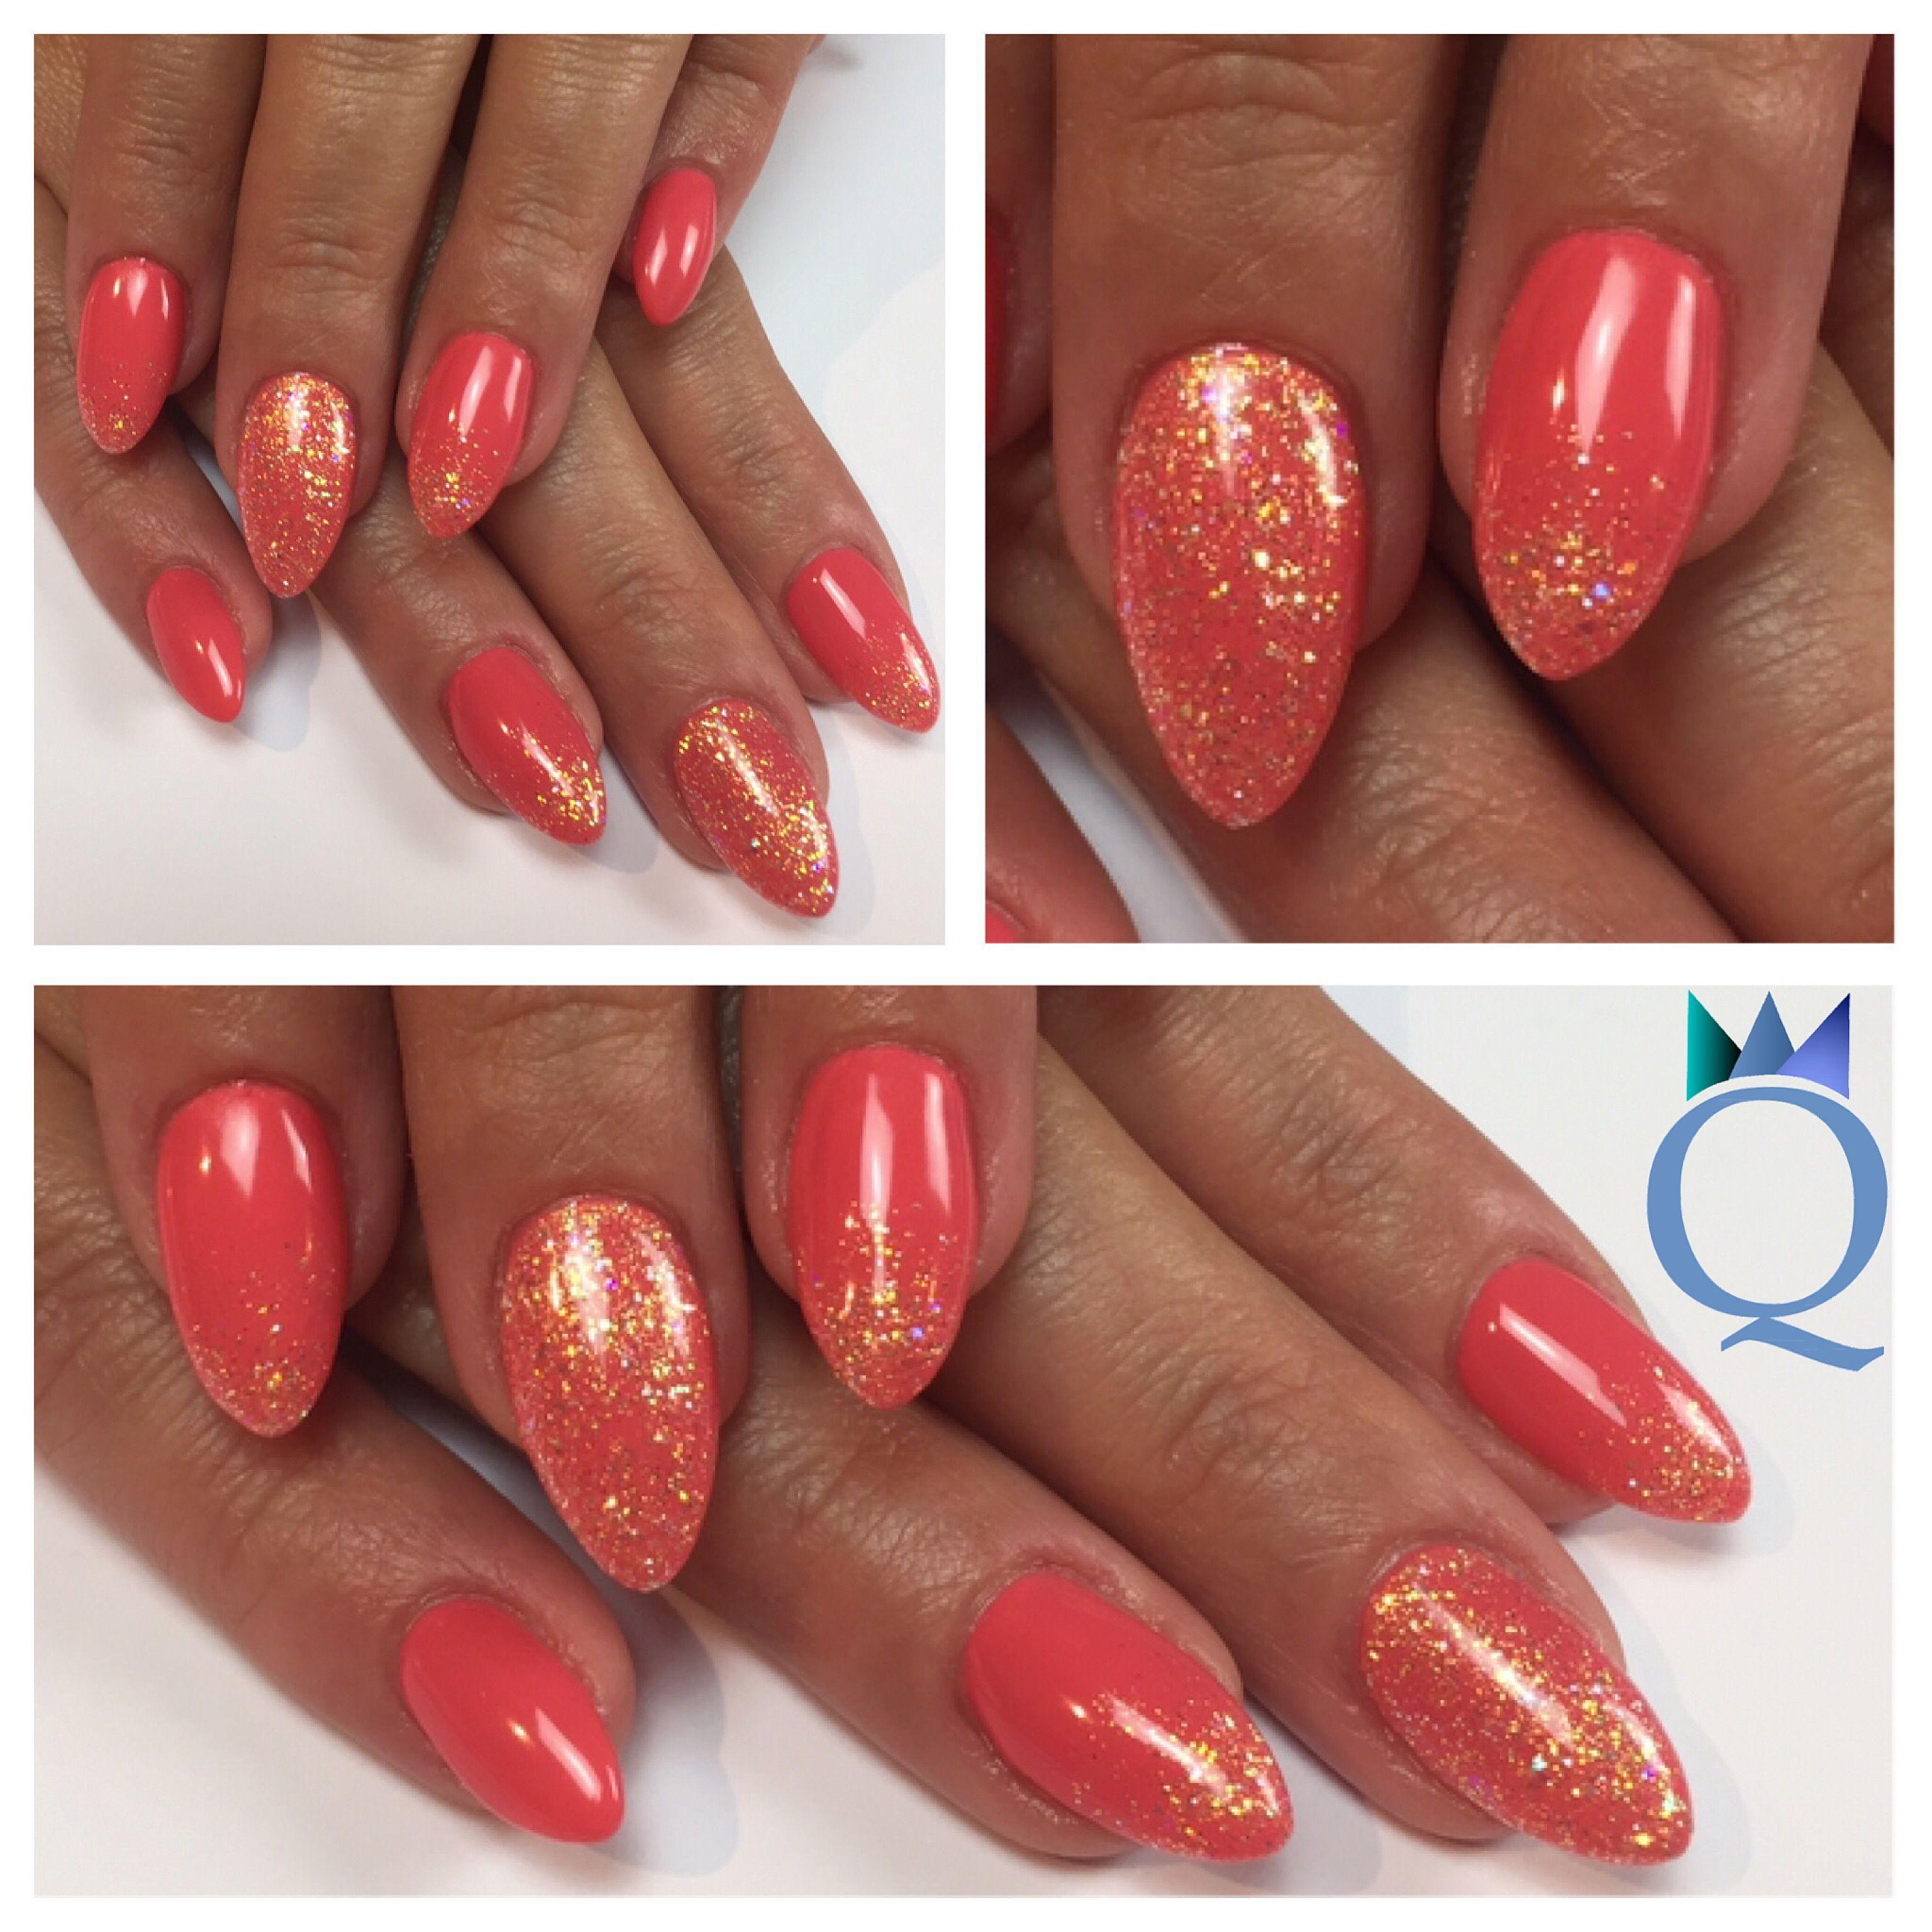 almondnails gelnails nails coral glitter nailcode. Black Bedroom Furniture Sets. Home Design Ideas